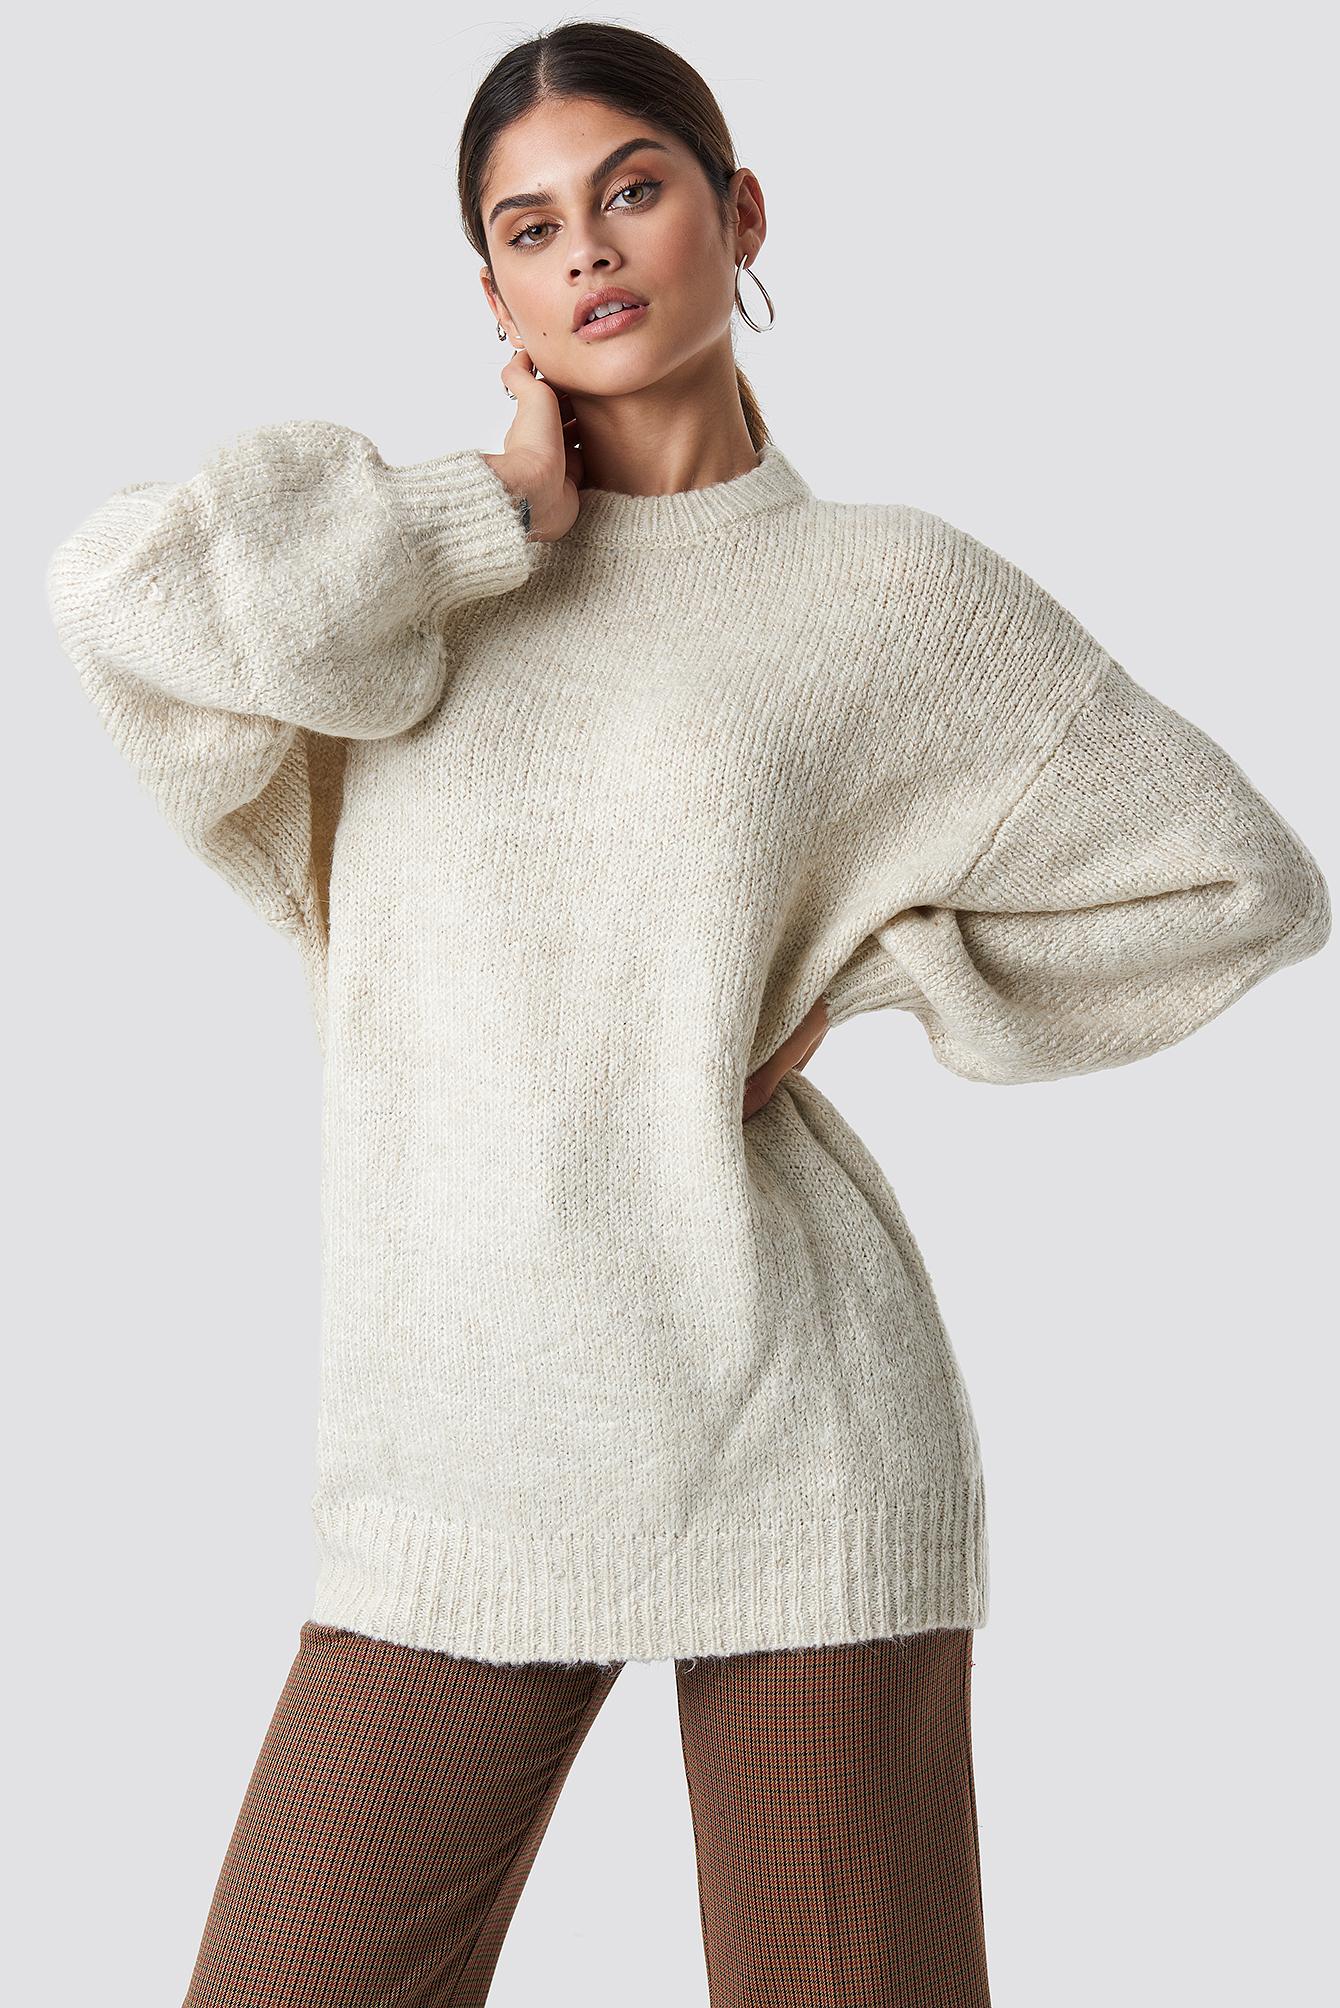 mango -  Saudade Sweater - Offwhite